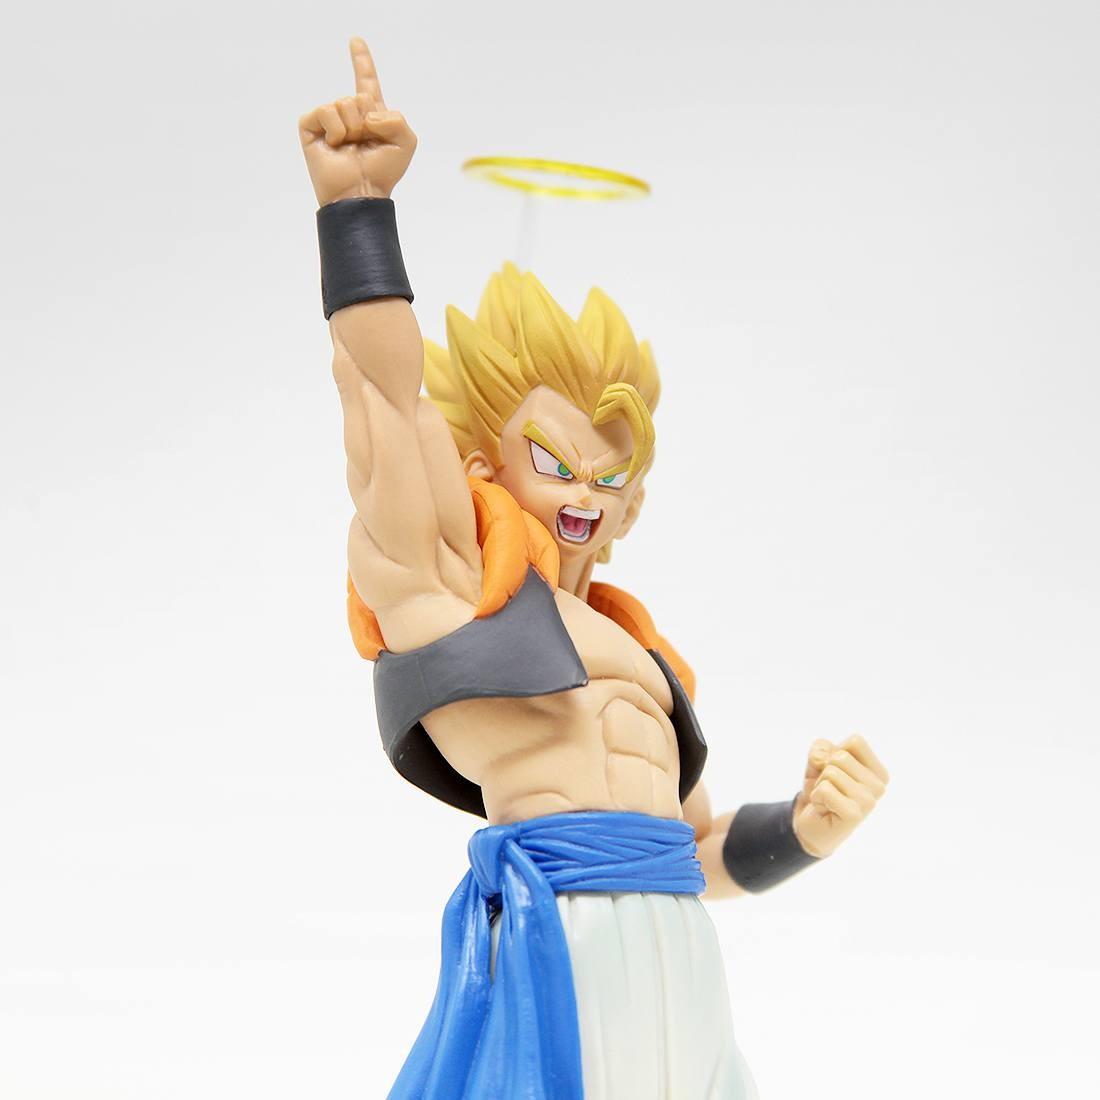 Banpresto Dragon Ball Z Com: Figuration Vol. 1 Super Saiyan Gogeta